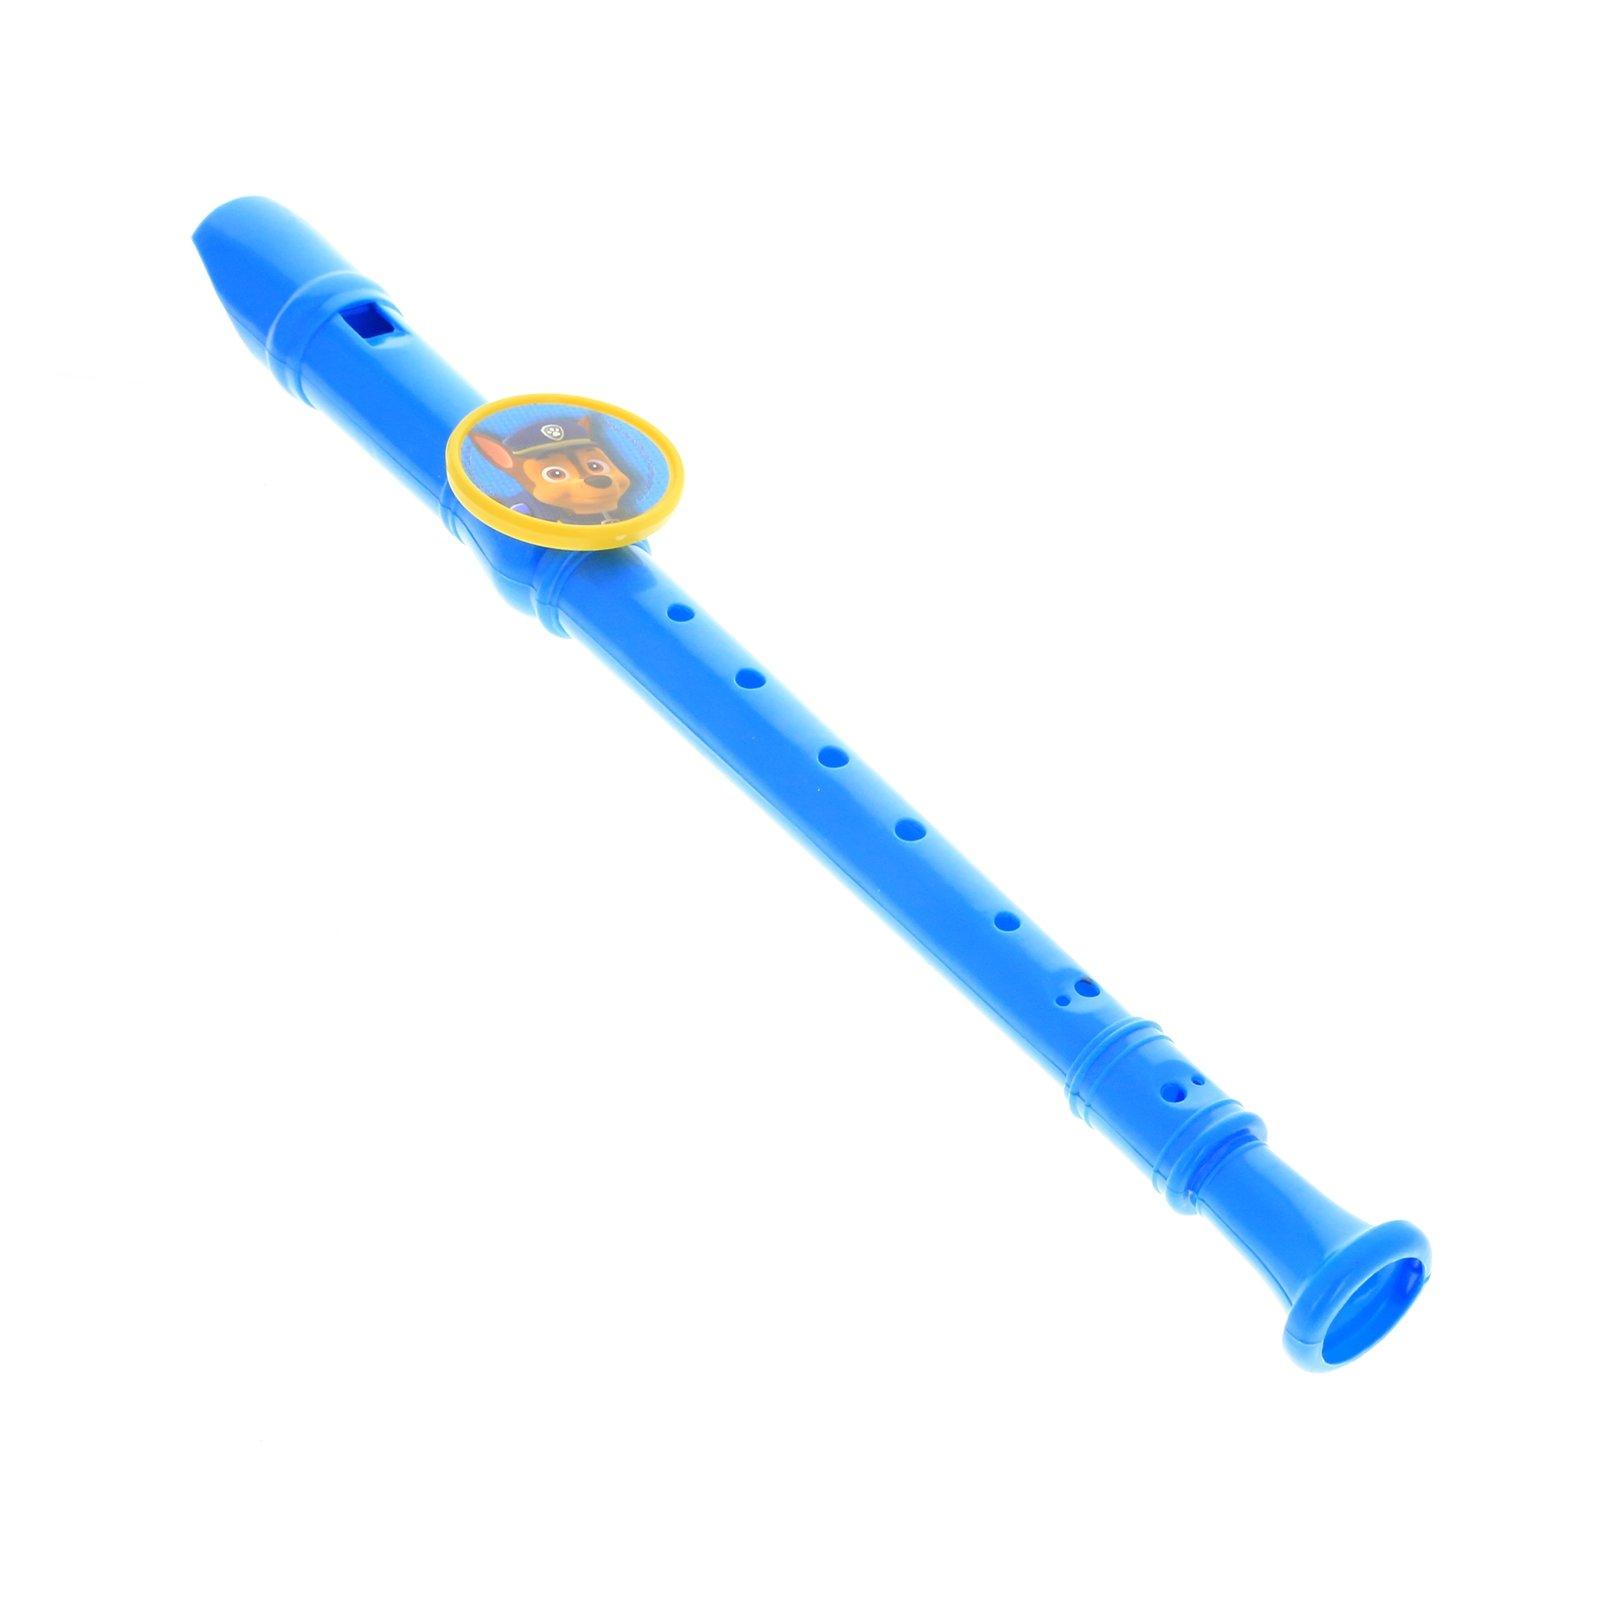 "Nickelodeon Paw Patrol 13.5"" Flute Recorder"